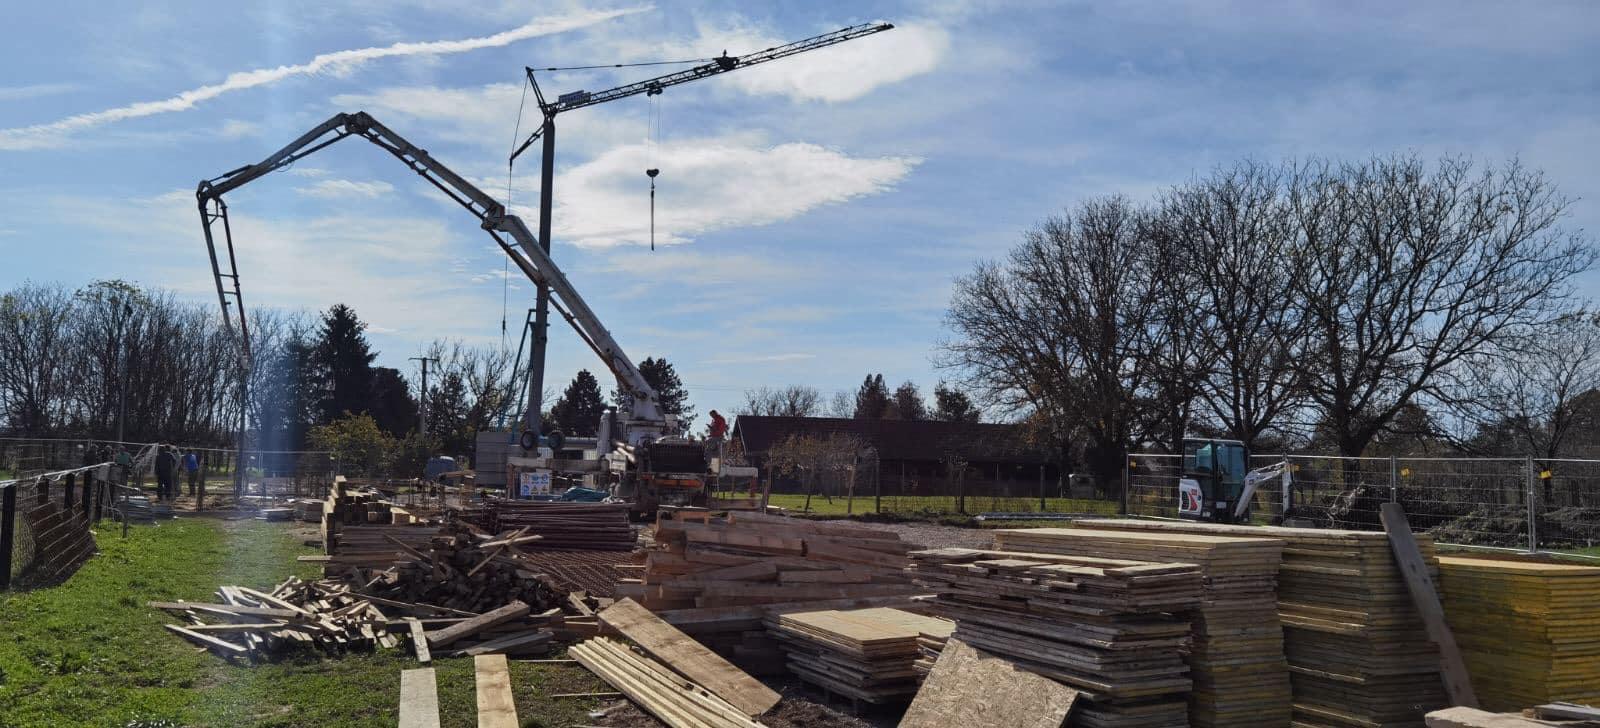 OPĆINSKI PROJEKTI Krenula i izgradnja sportskog centra